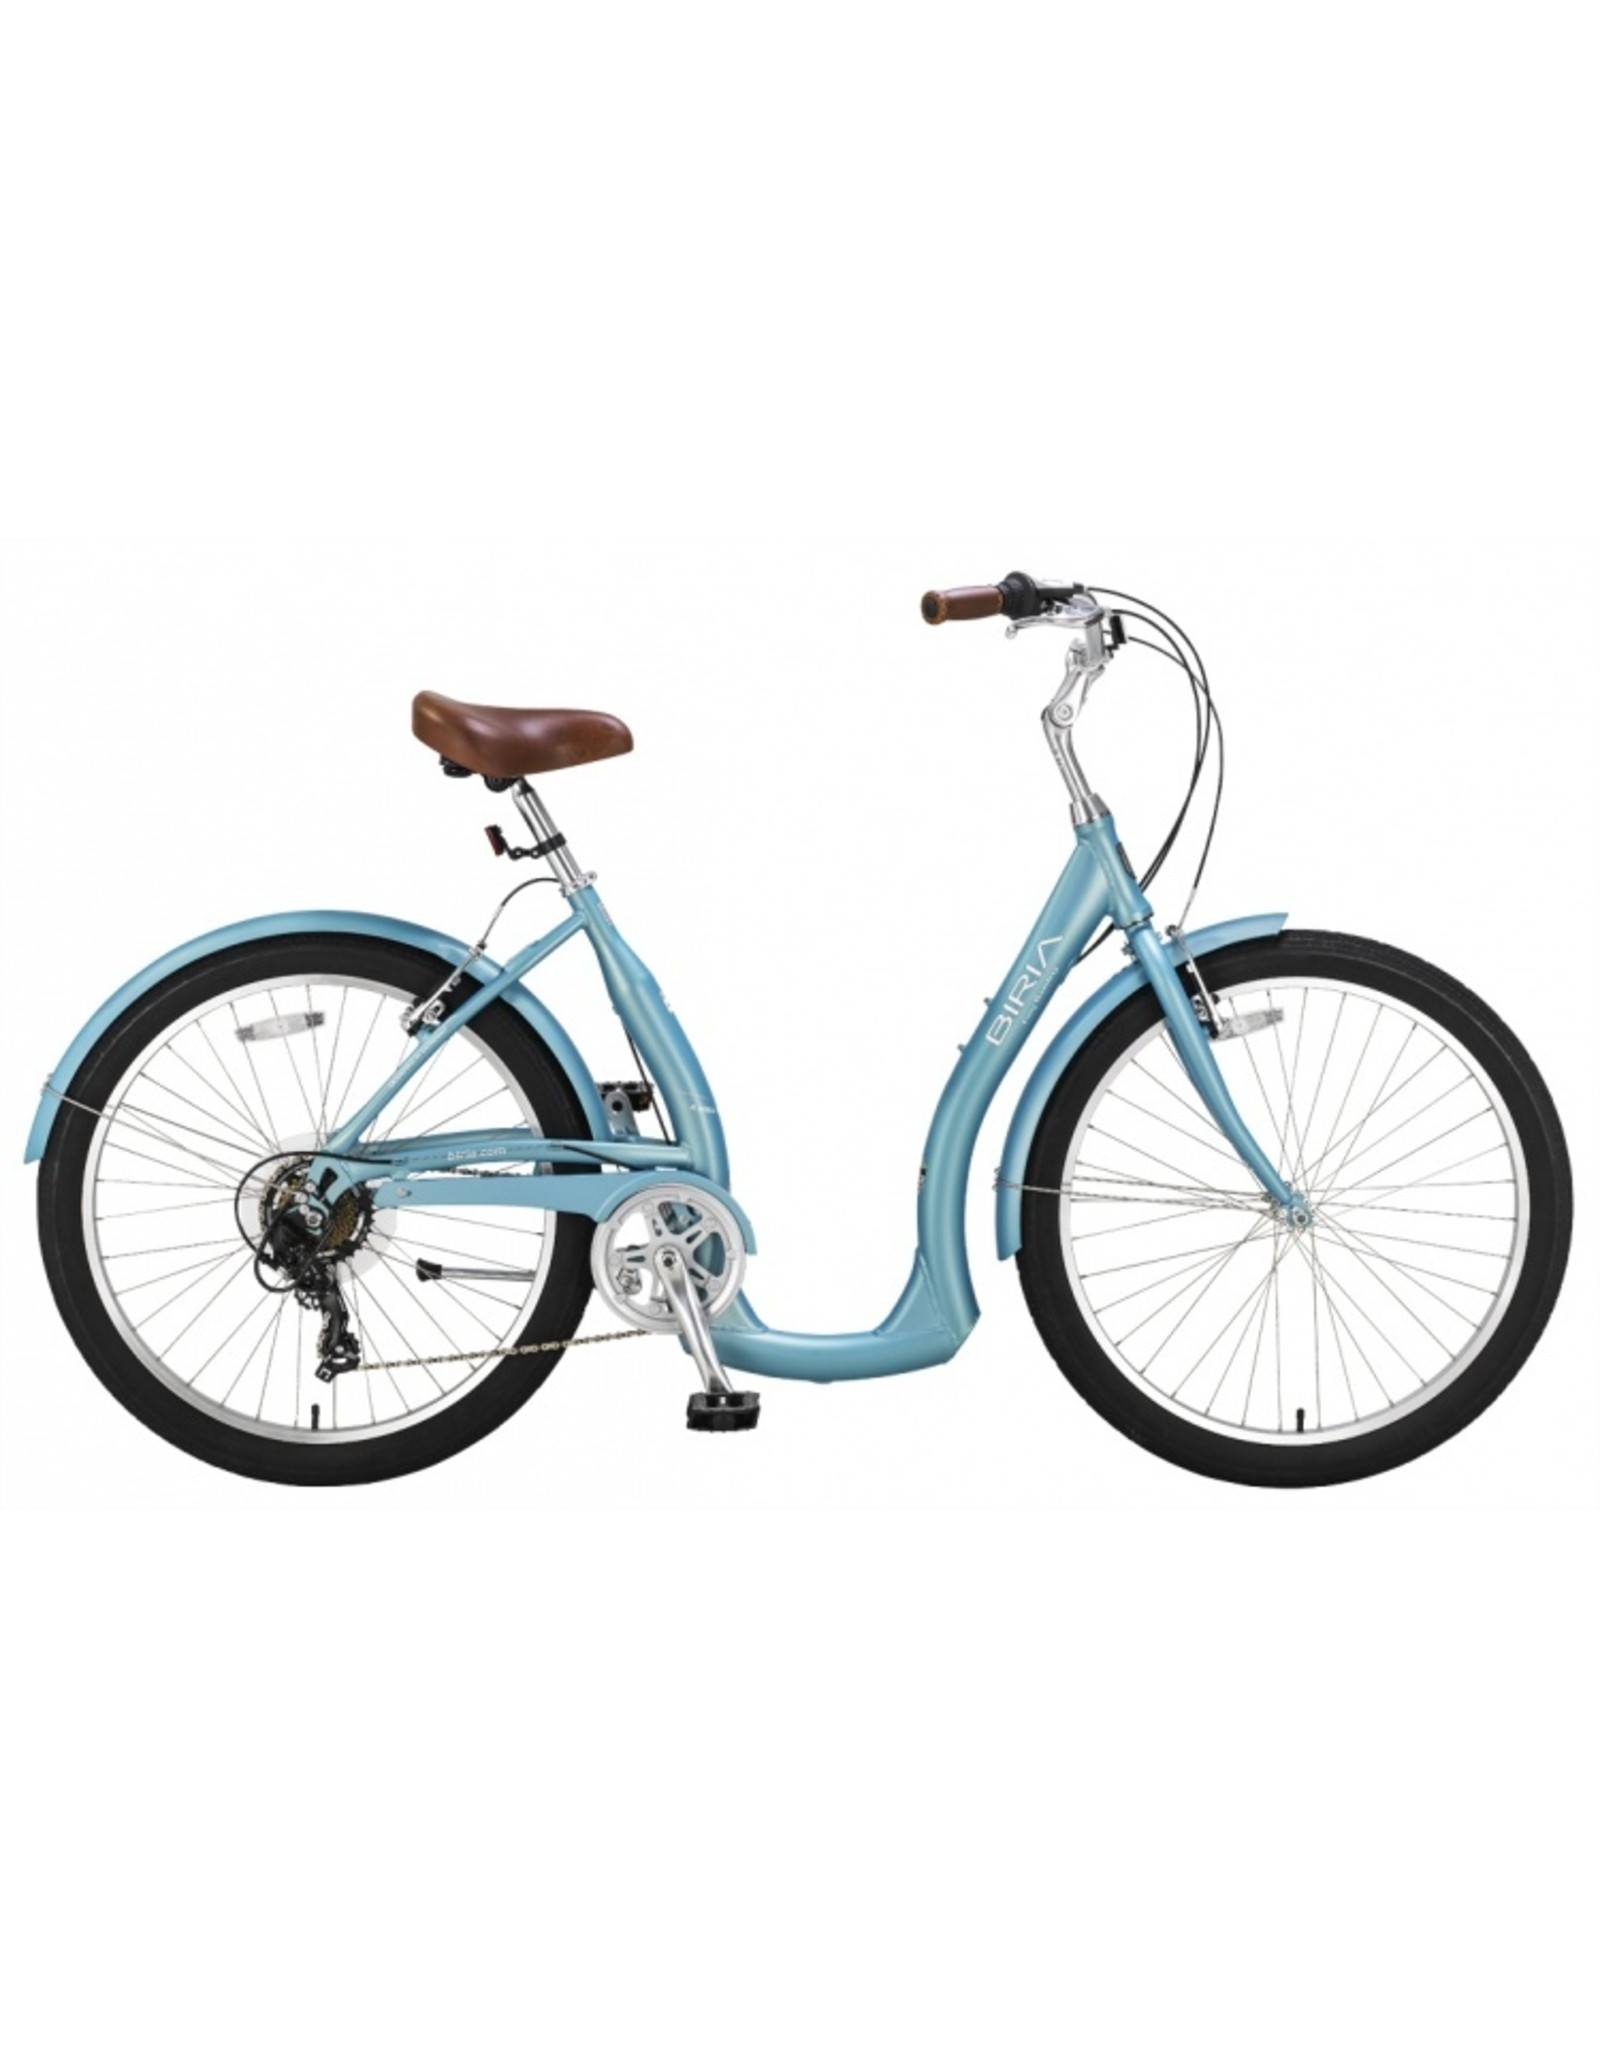 Biria Bikes Easy boarding Easy 7, 7 speed Derailleur, 15, Aqua Blue